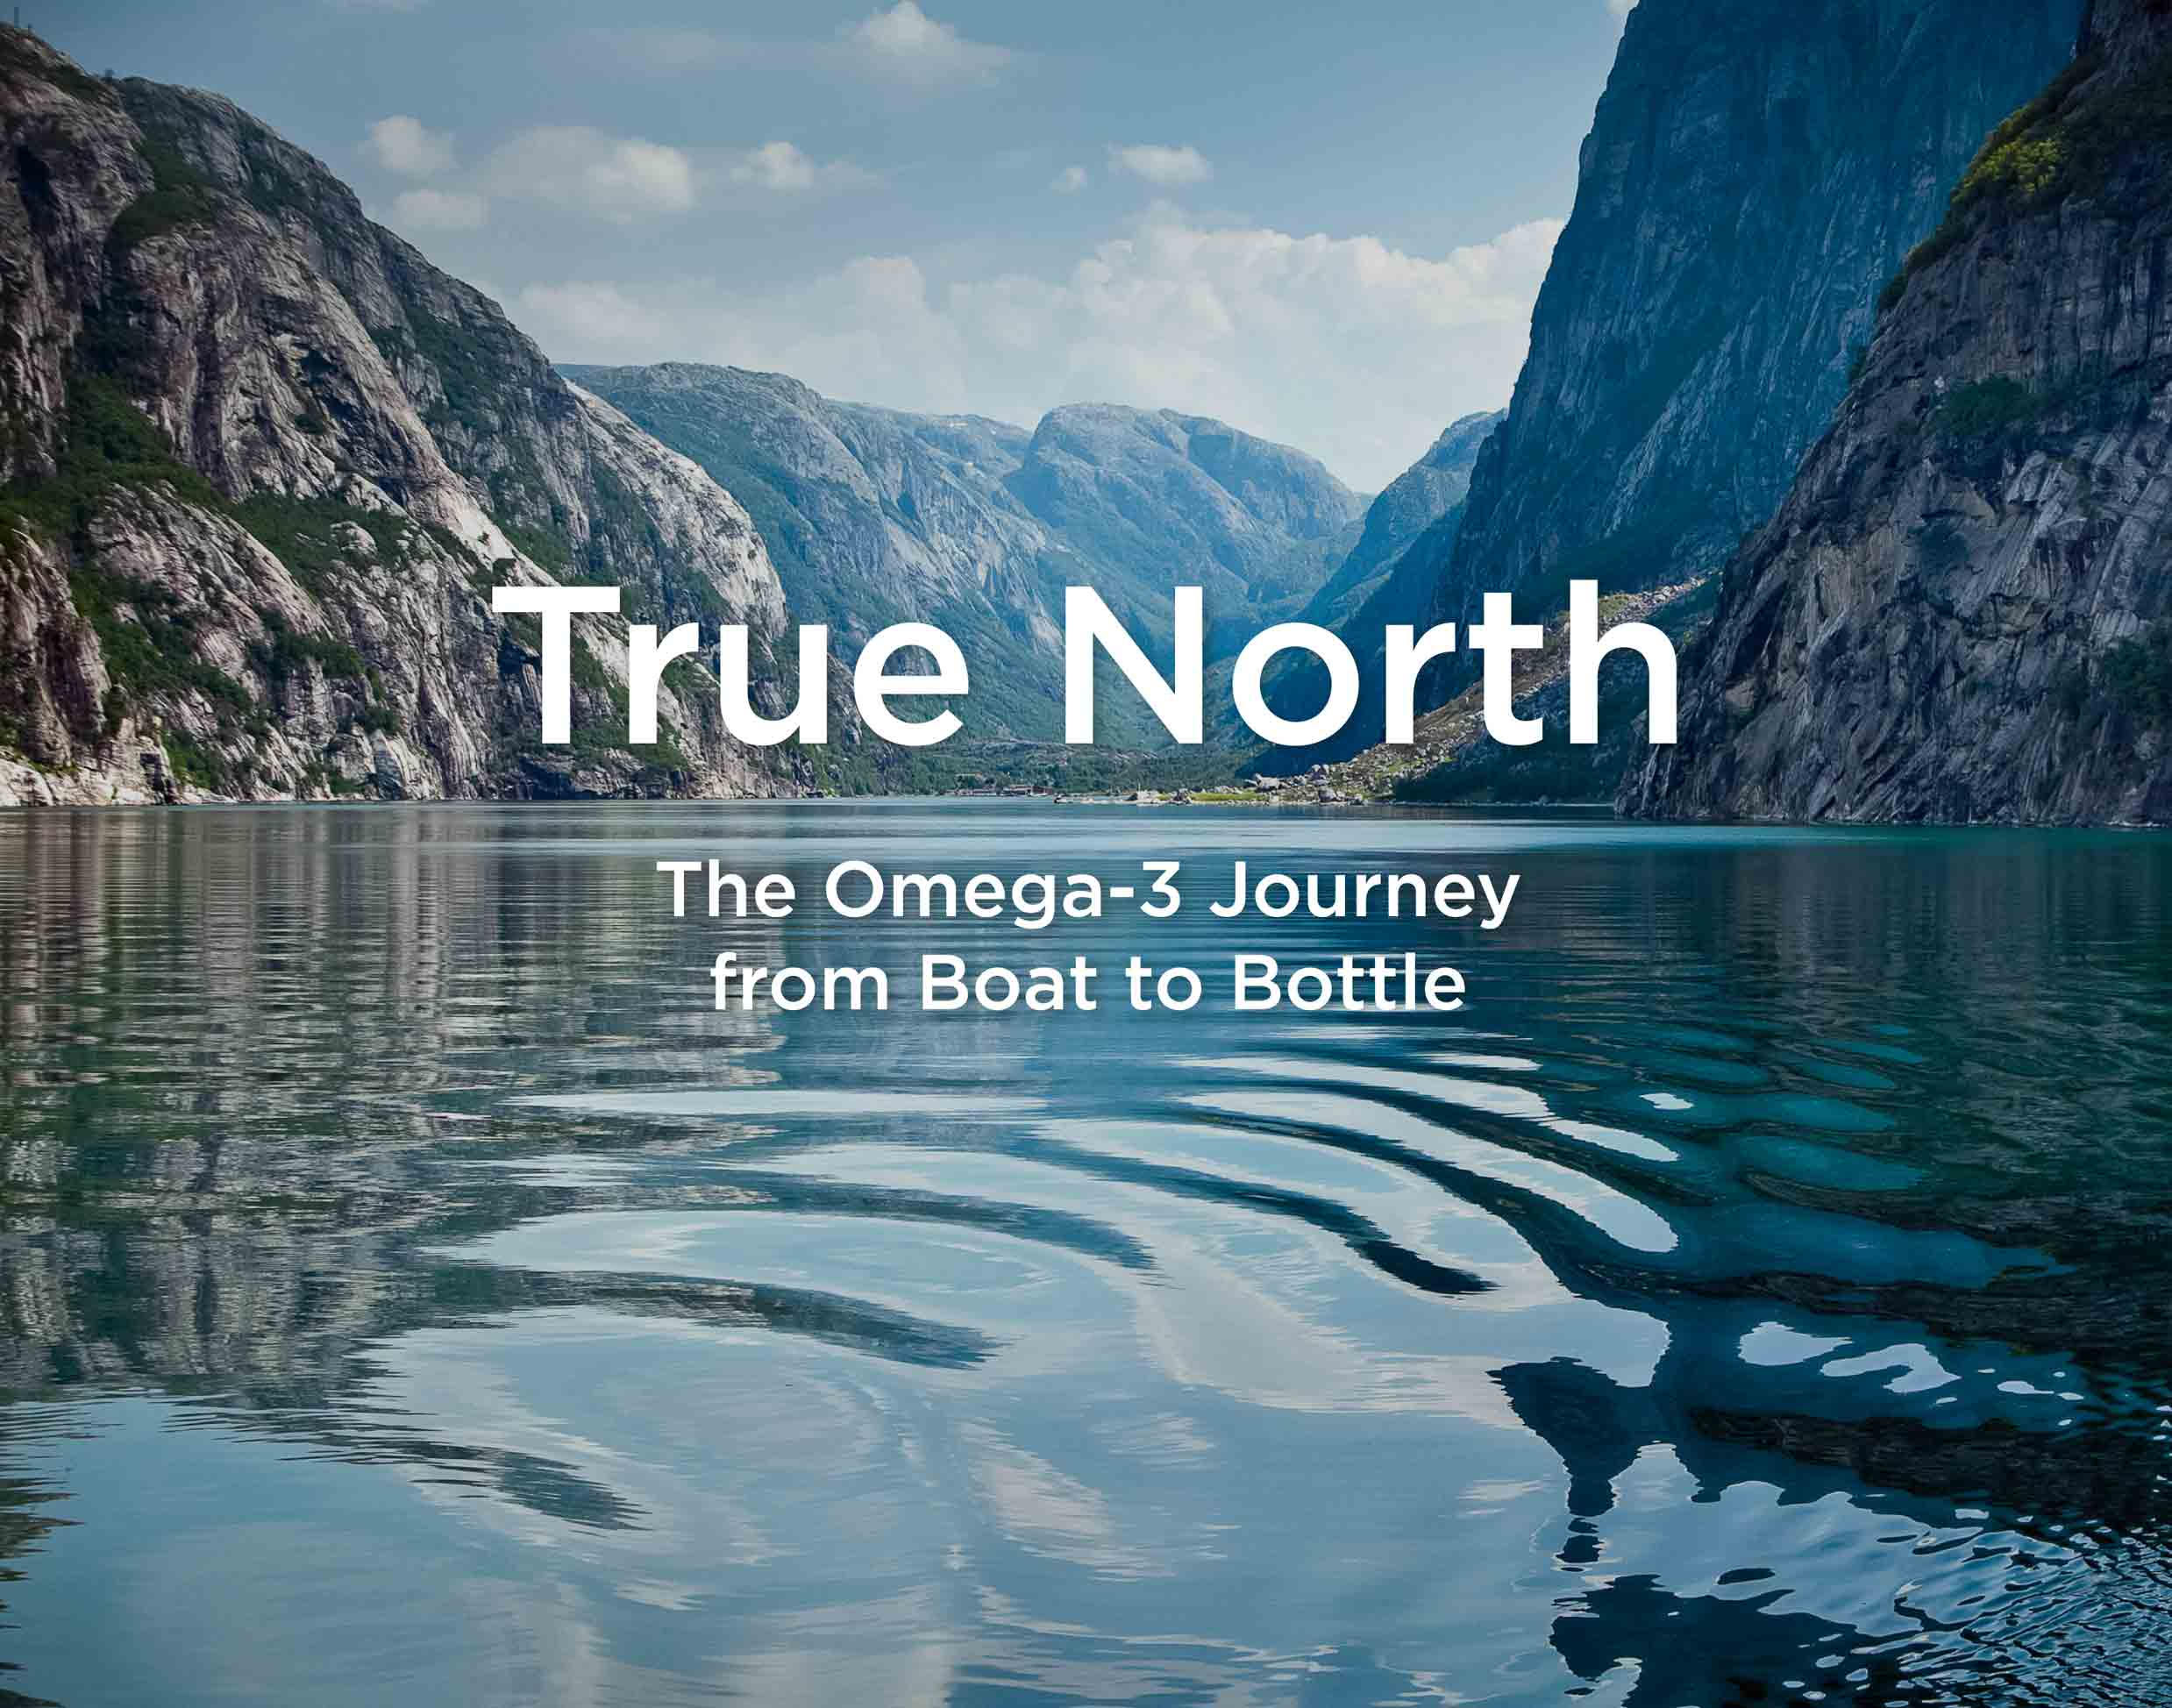 Nordic Naturals Omega-3 Soft Gels - Omega-3 Essent...